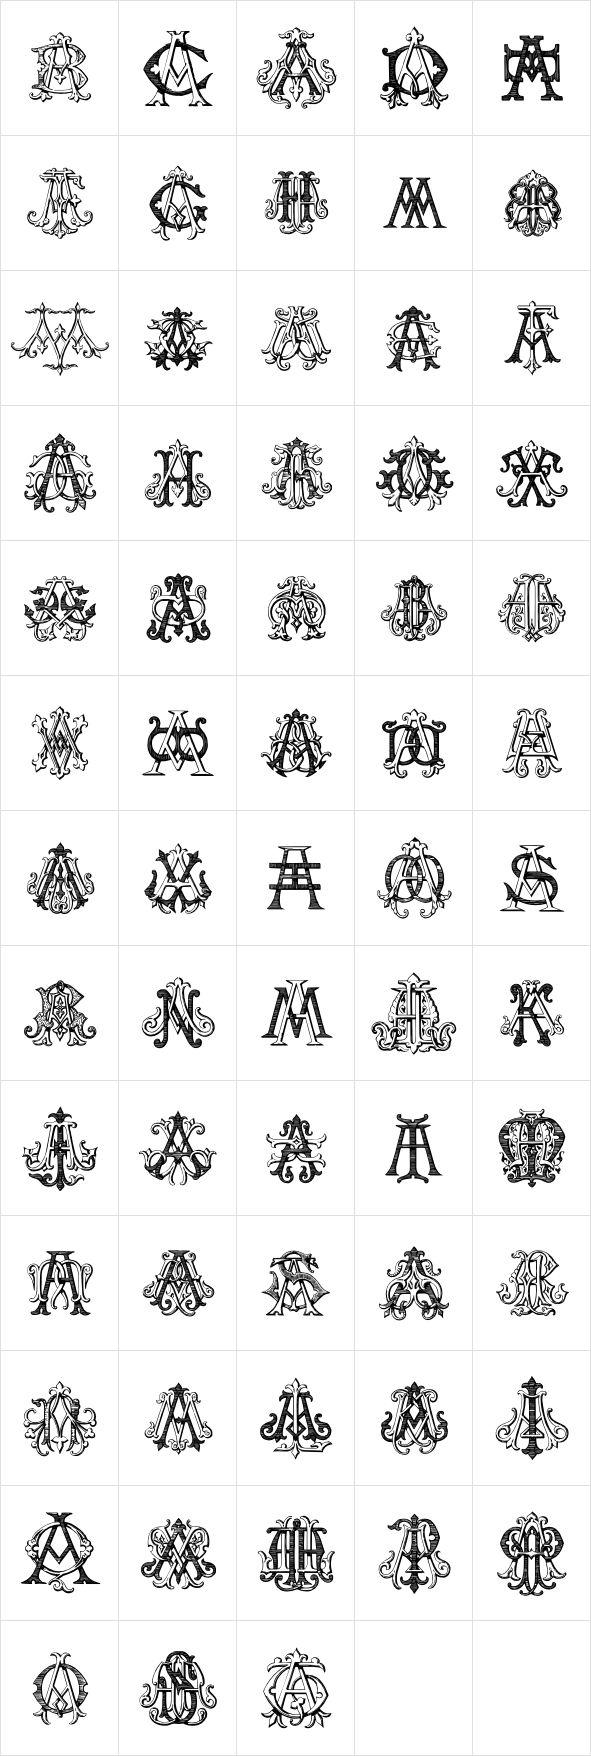 Intellecta Monograms by Intellecta Design - Desktop Font, WebFont and Mobile Font - YouWorkForThem #chadlonius #monograms